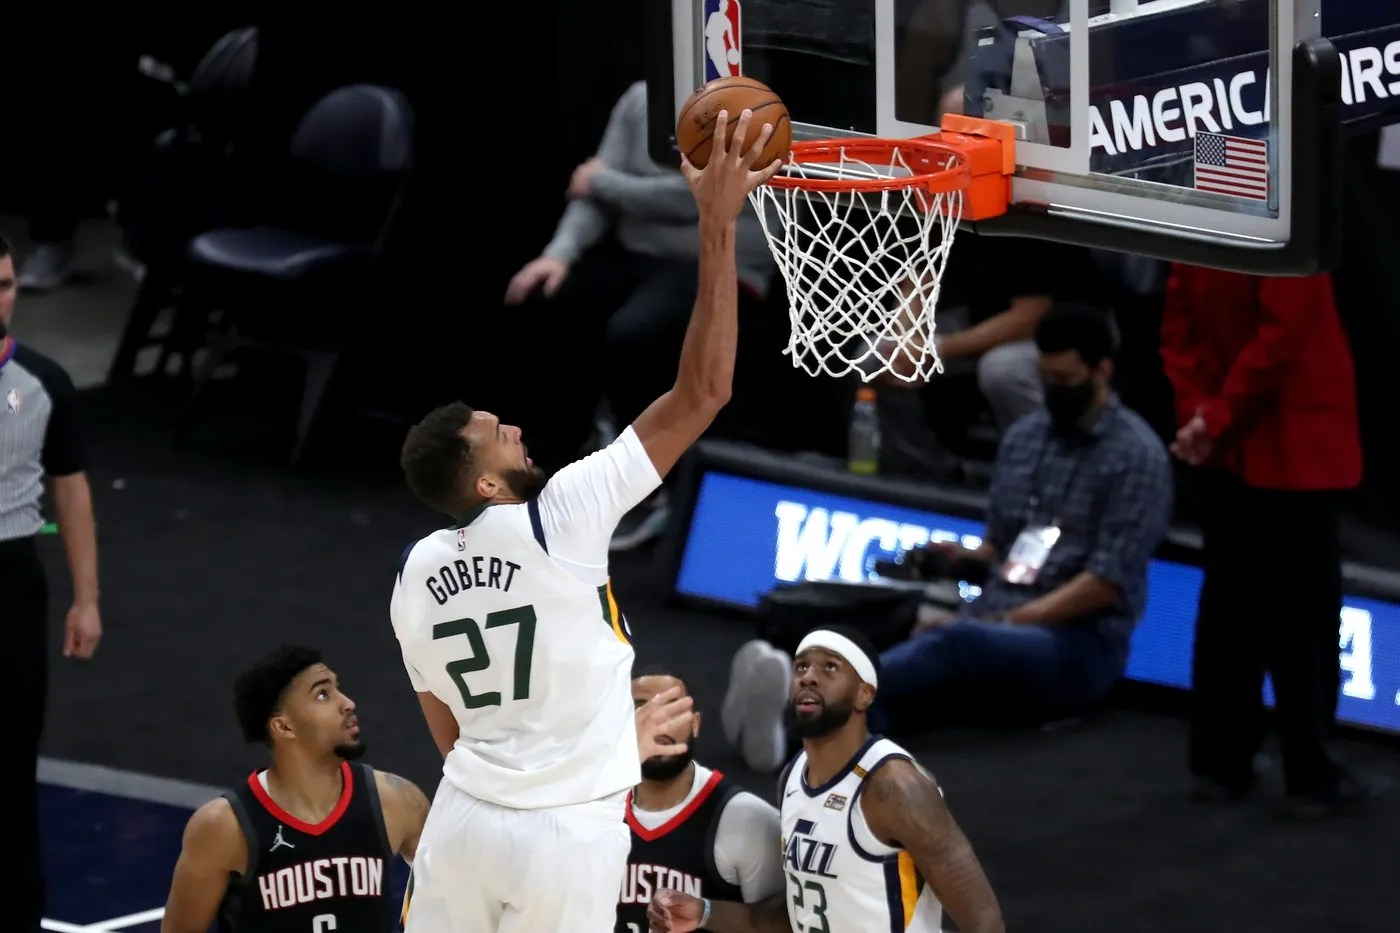 May 8, 2021; Salt Lake City, Utah, USA; Utah Jazz center Rudy Gobert (27) dunks the ball against the Houston Rockets in the third quarter at Vivint Arena.